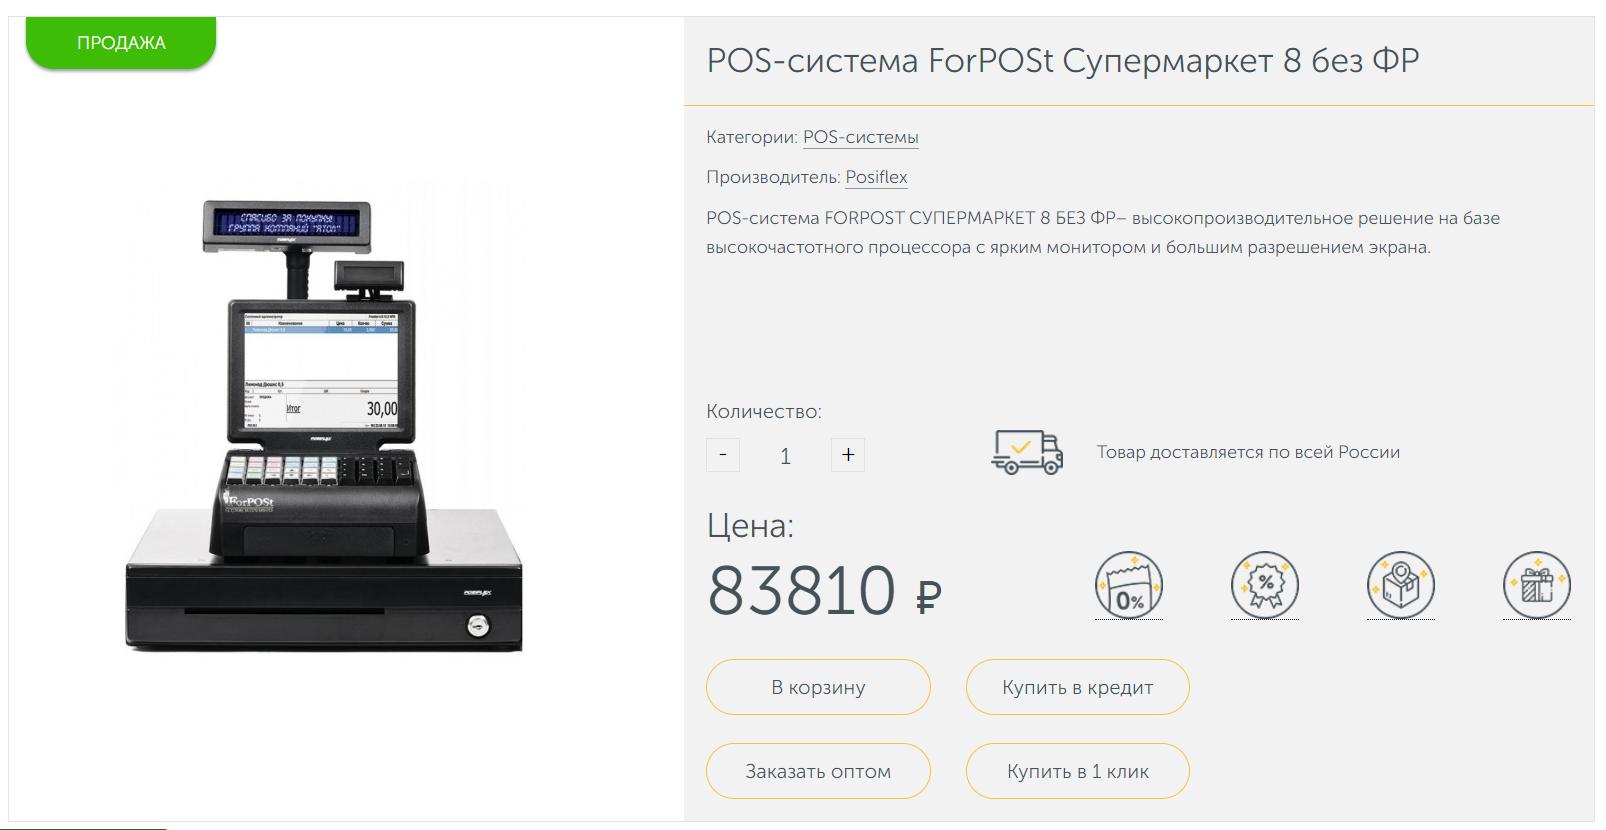 POS-система FORPOST супермаркет 8